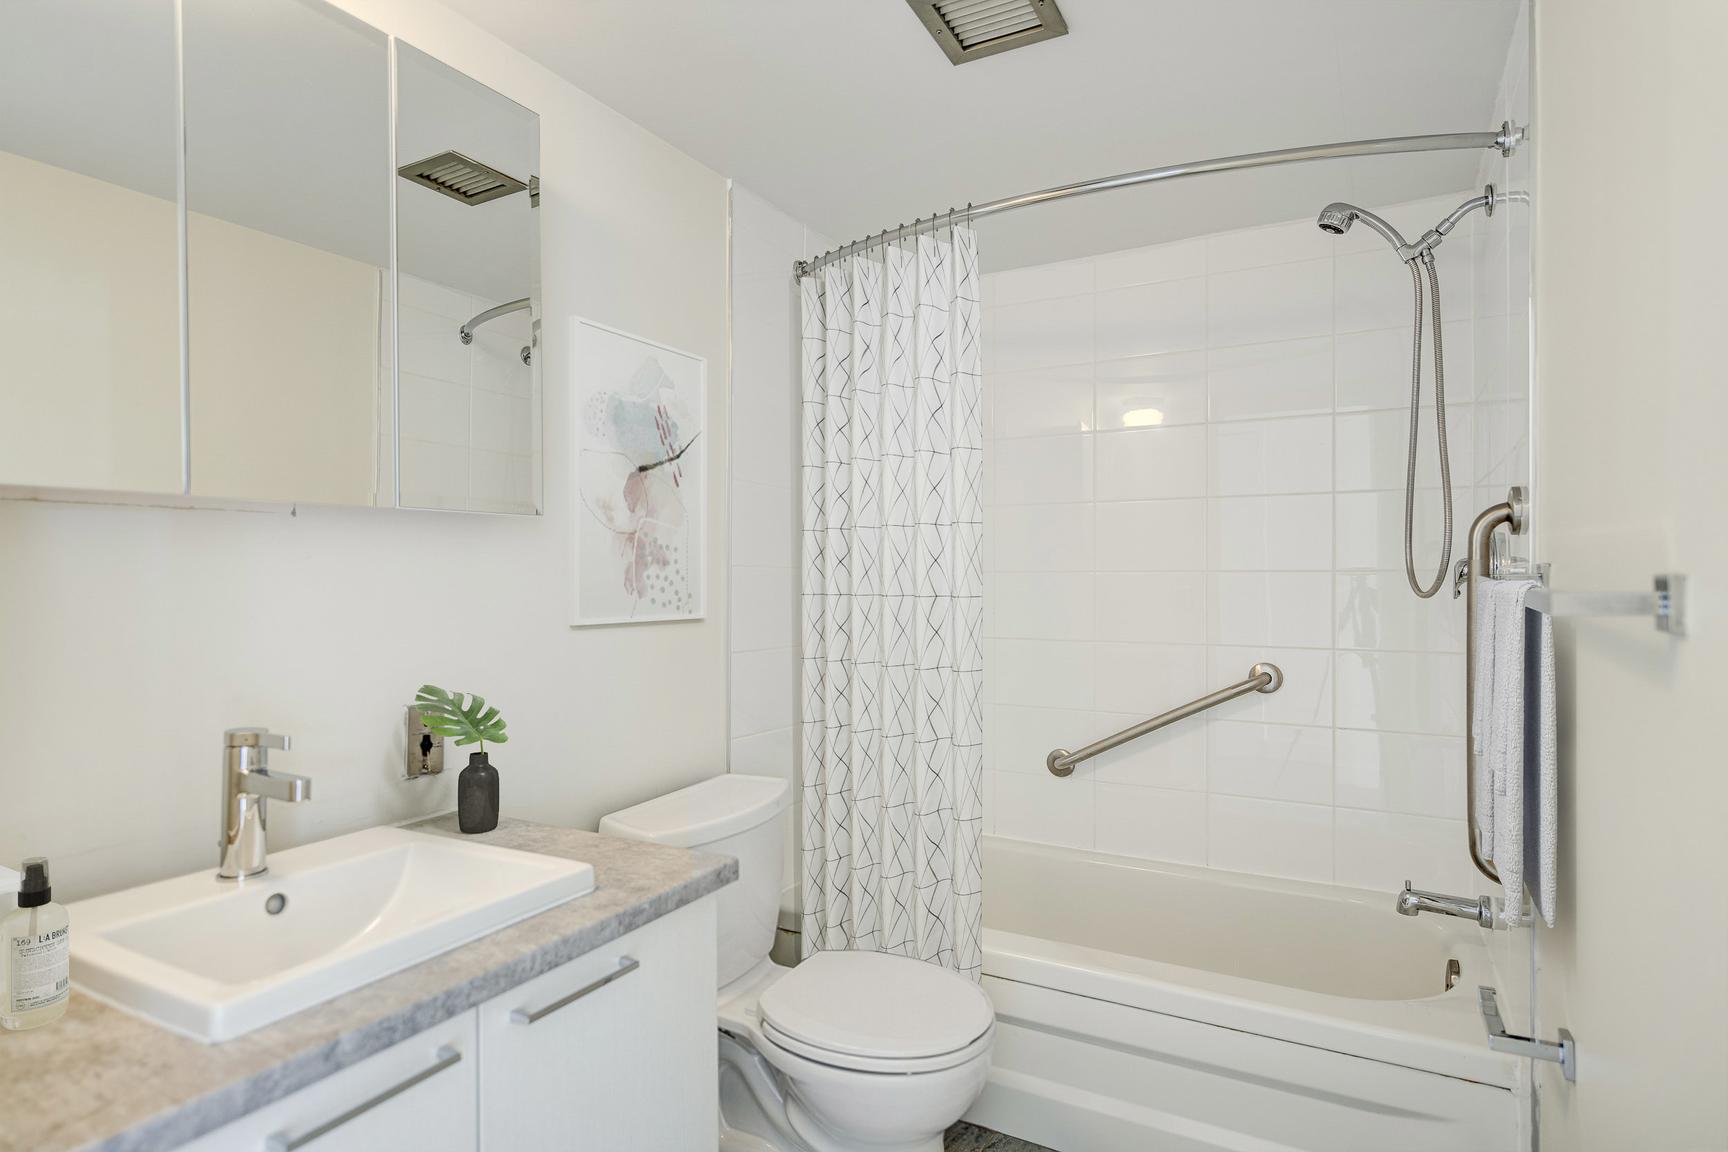 1 bedroom Apartments for rent in Laval at Le Quatre Cent - Photo 10 - RentQuebecApartments – L407183